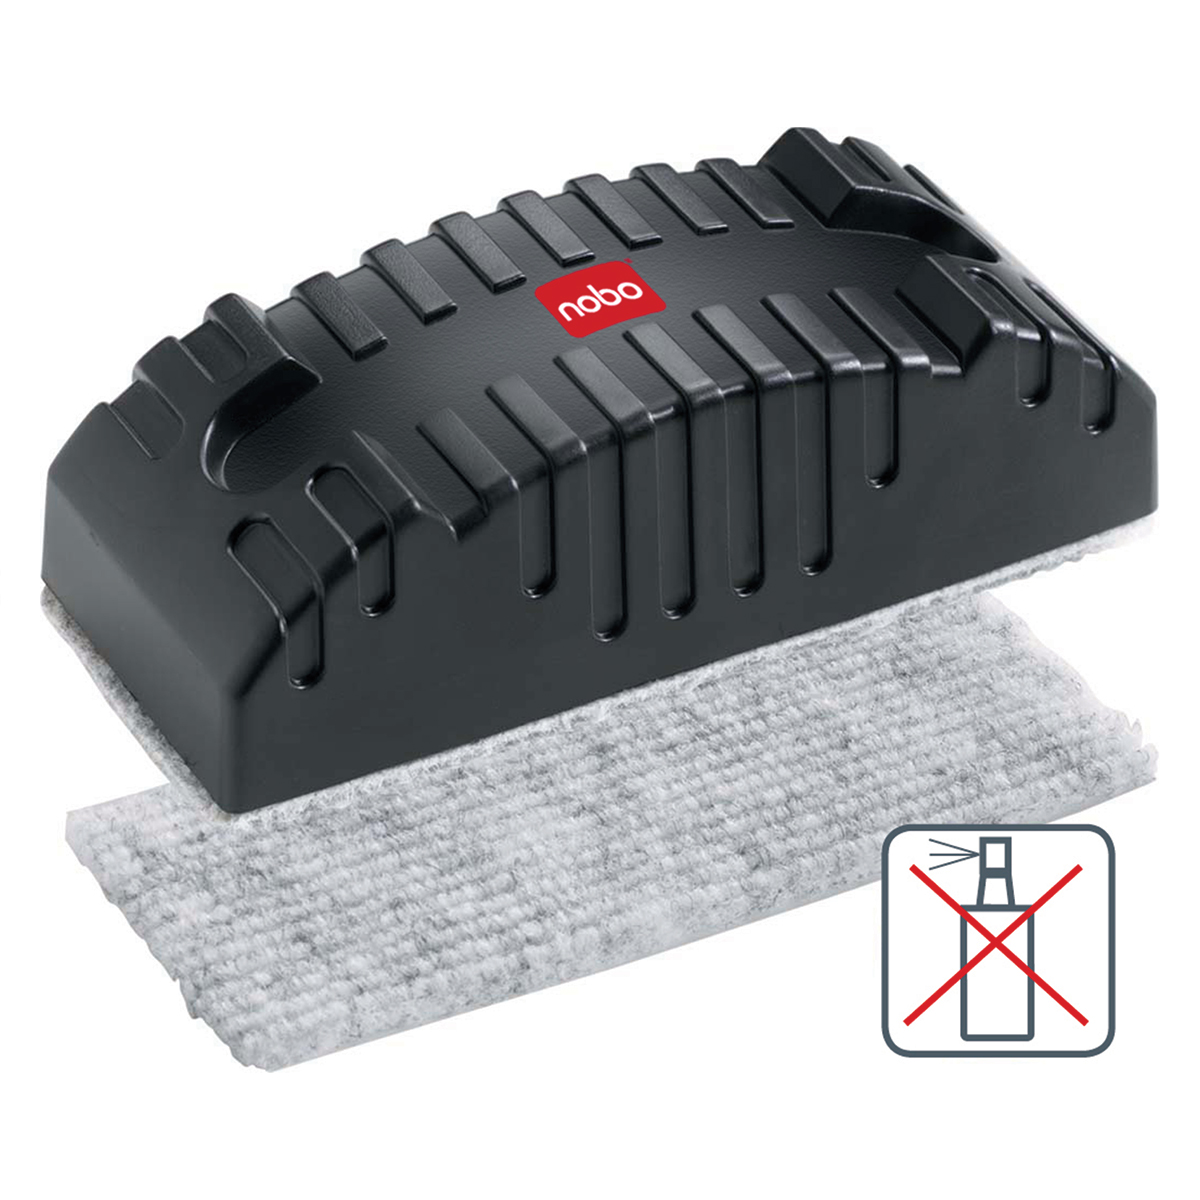 Nobo 34533421 Magnetic Whiteboard Erasers